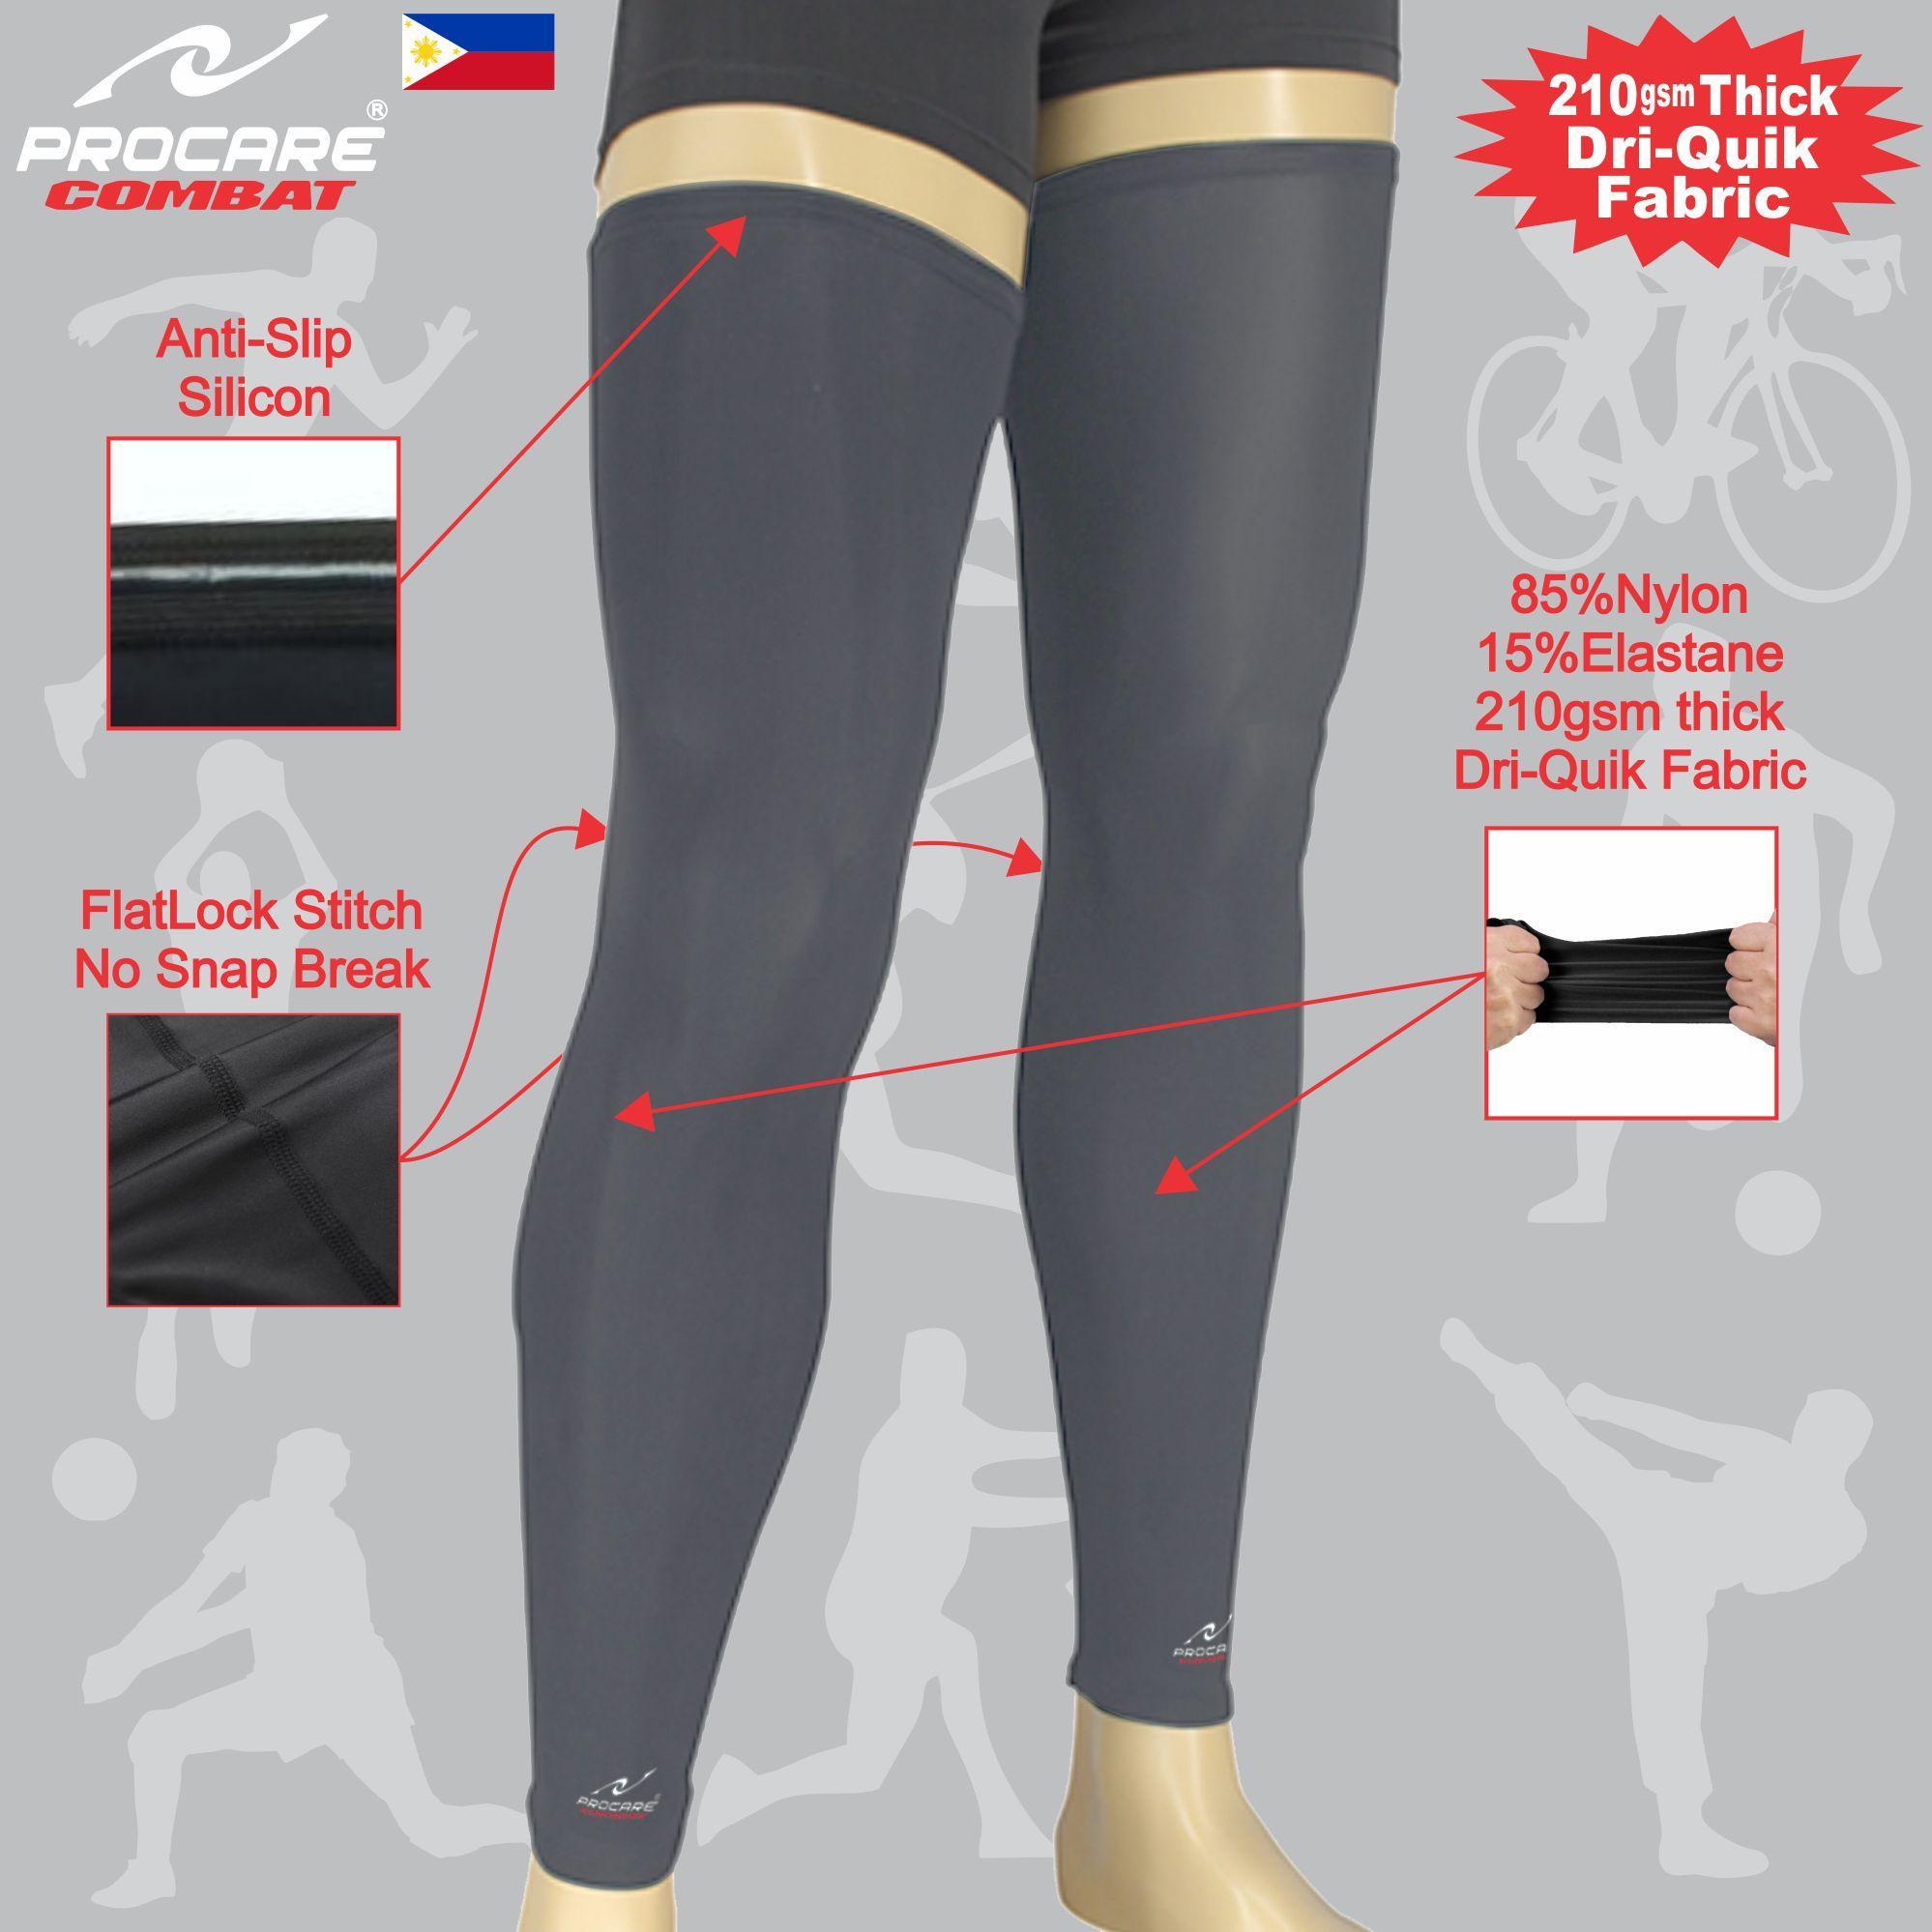 2a91352bee PROCARE COMBAT #5298 Compression Full Leg Sleeves, Dri-Quik Fabric Unisex  Pair (